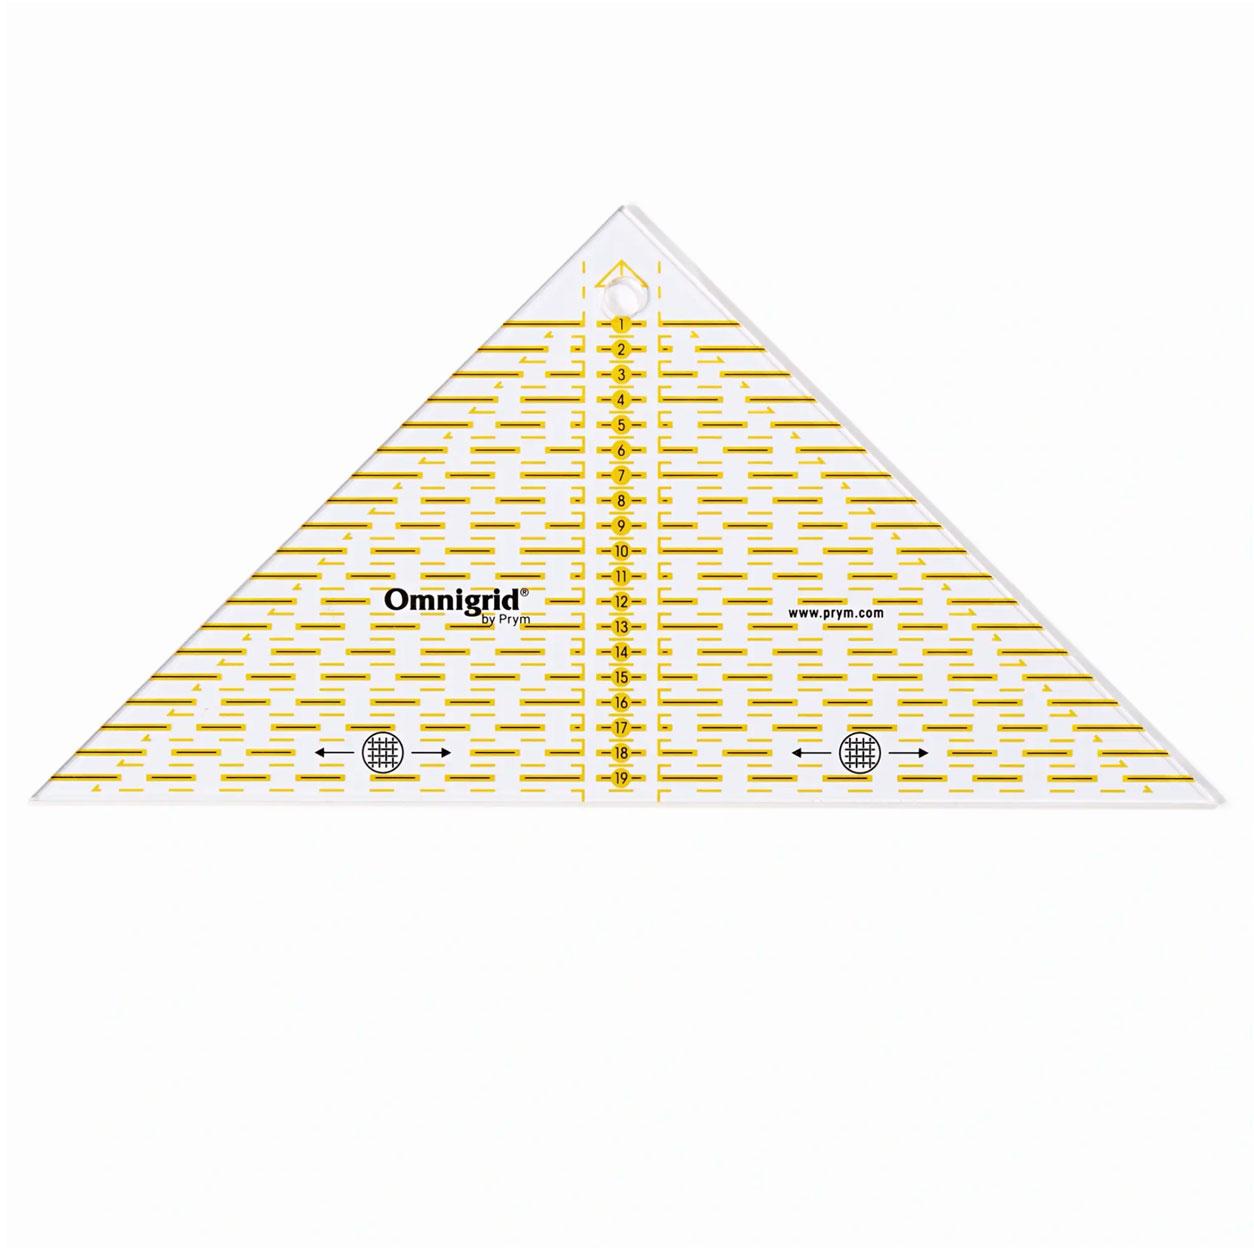 Triangolo Prym con Scala in cm